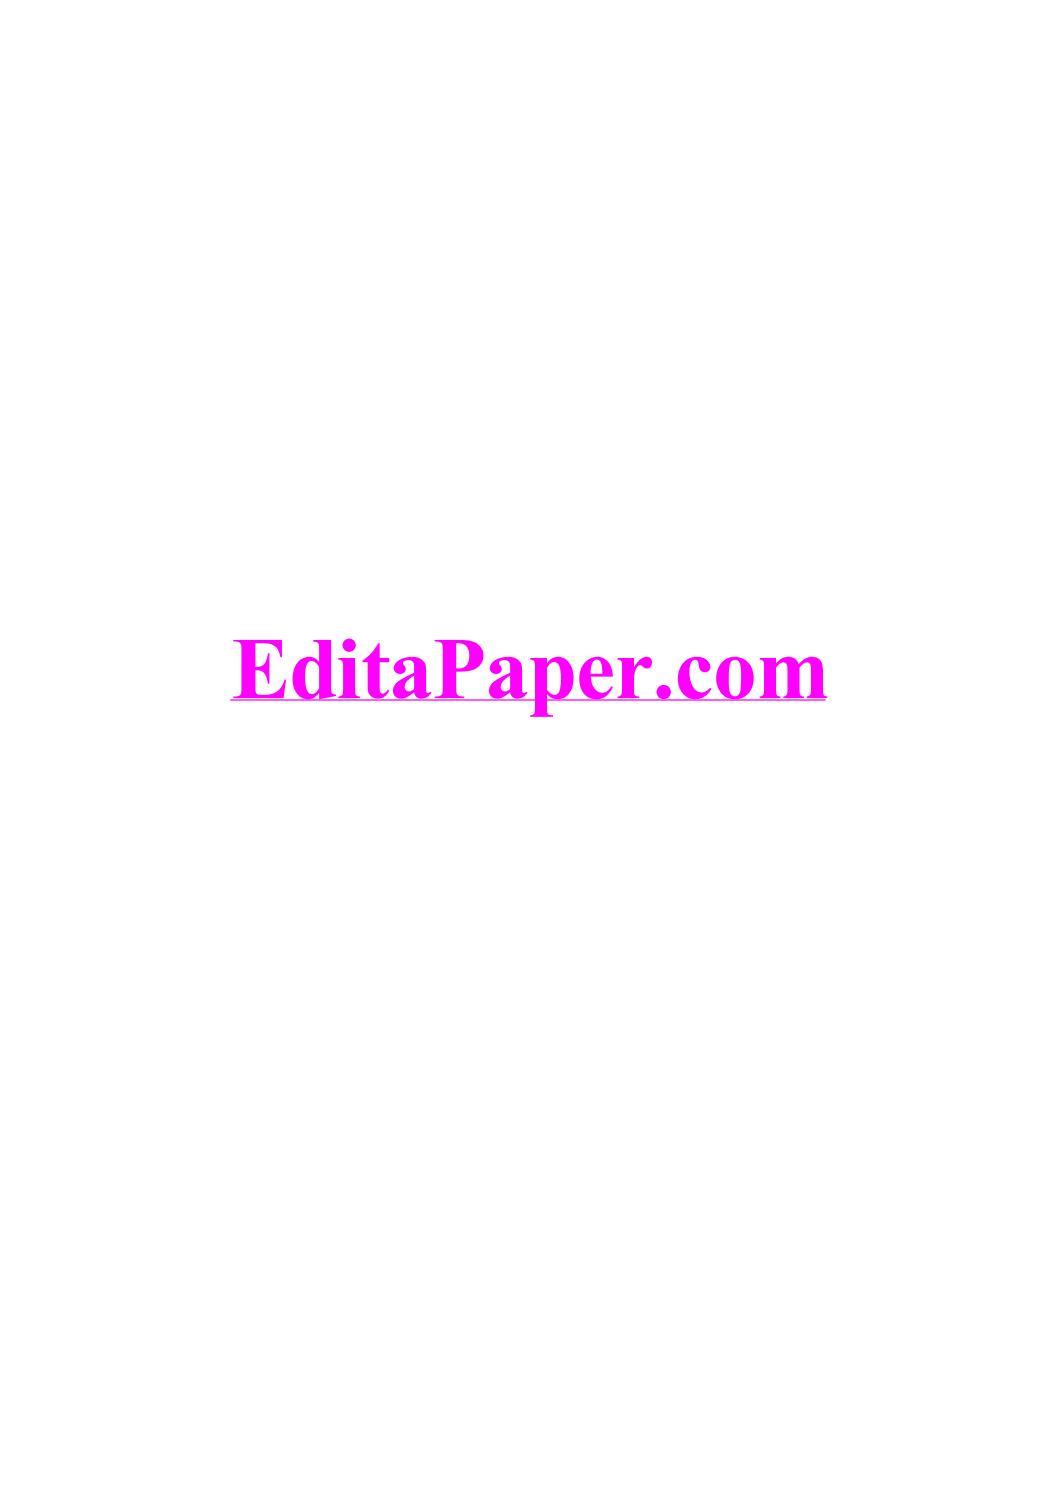 Essaytyper mobile bill pay service center